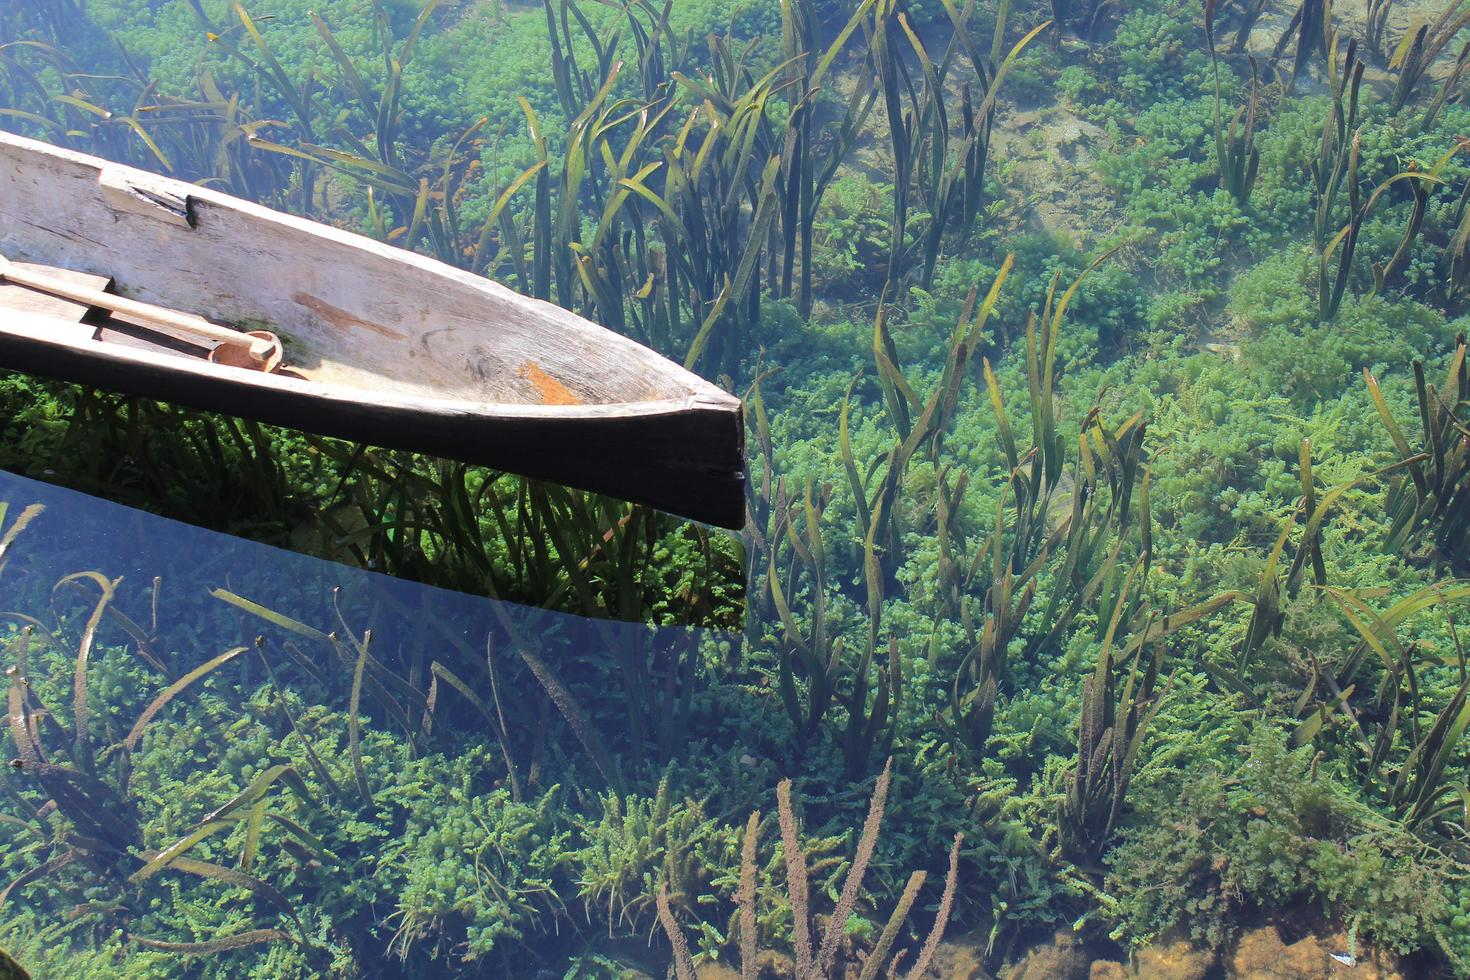 houten kano op waterlichaam foto